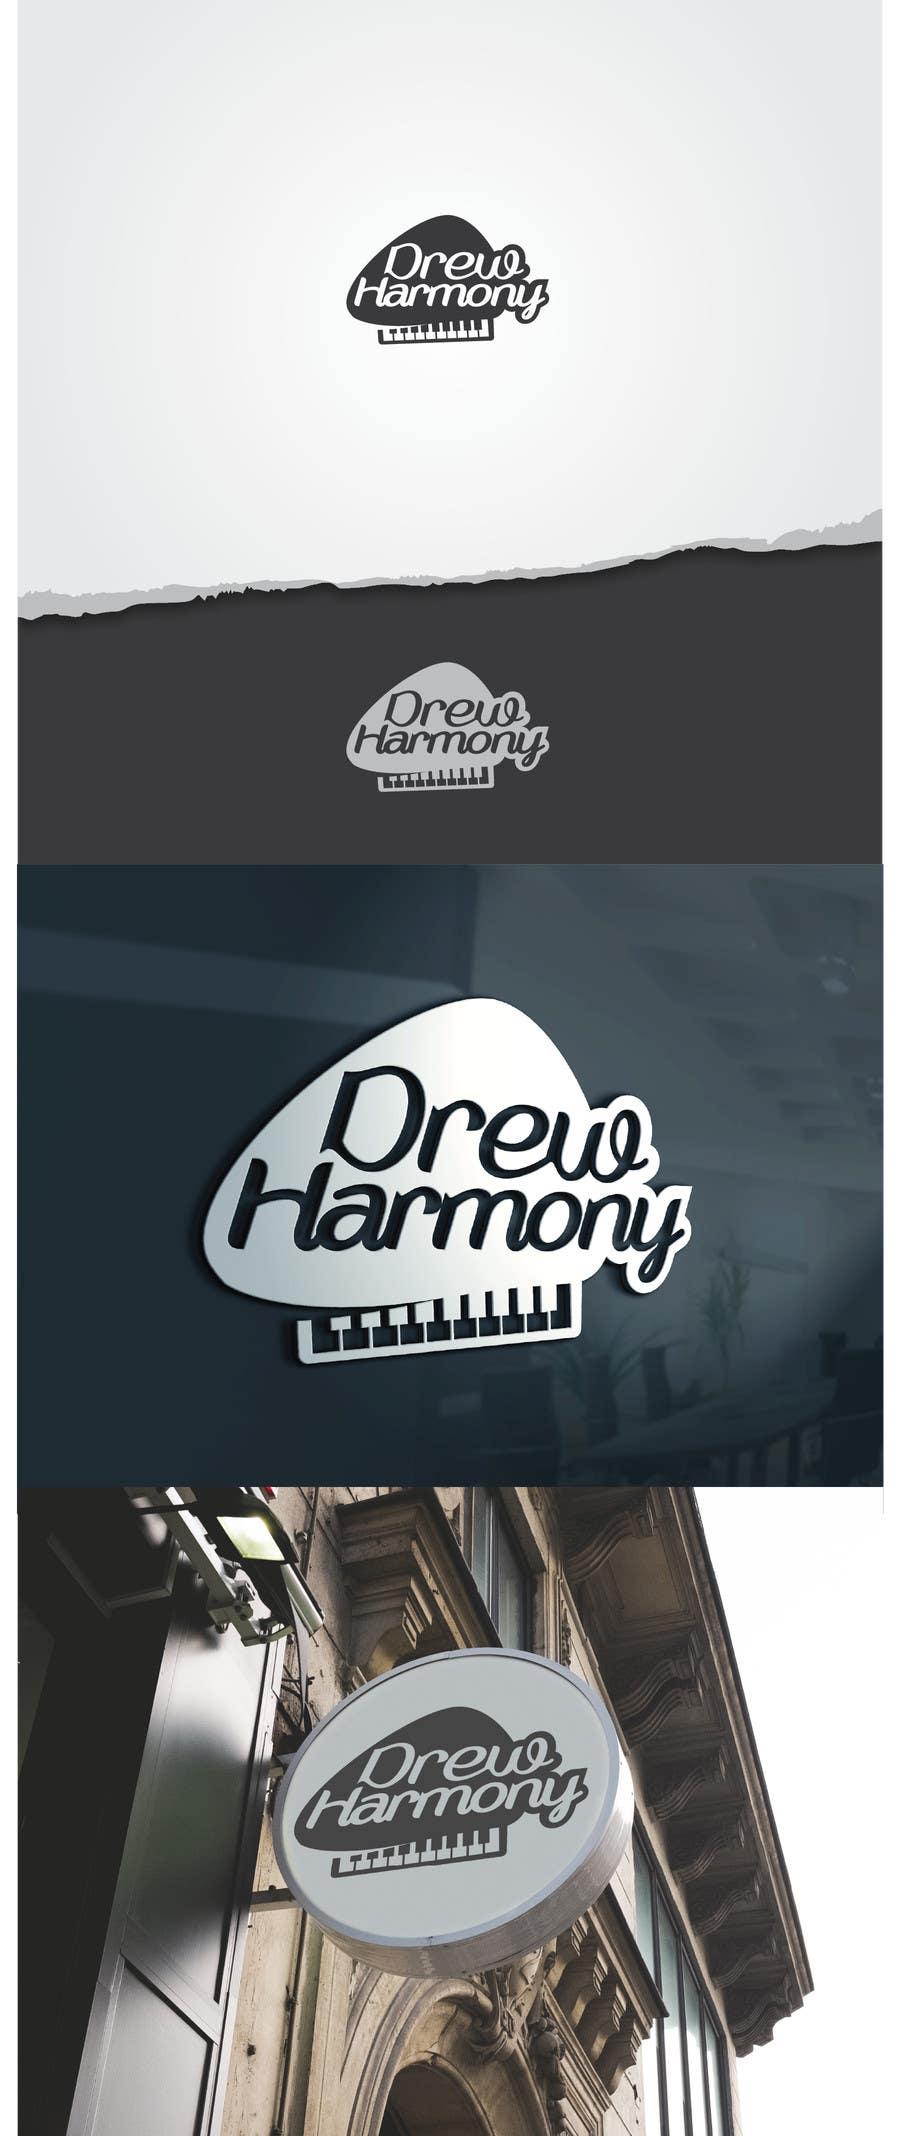 "Konkurrenceindlæg #                                        66                                      for                                         Design a Logo for My Name ""Drew Harmony"""